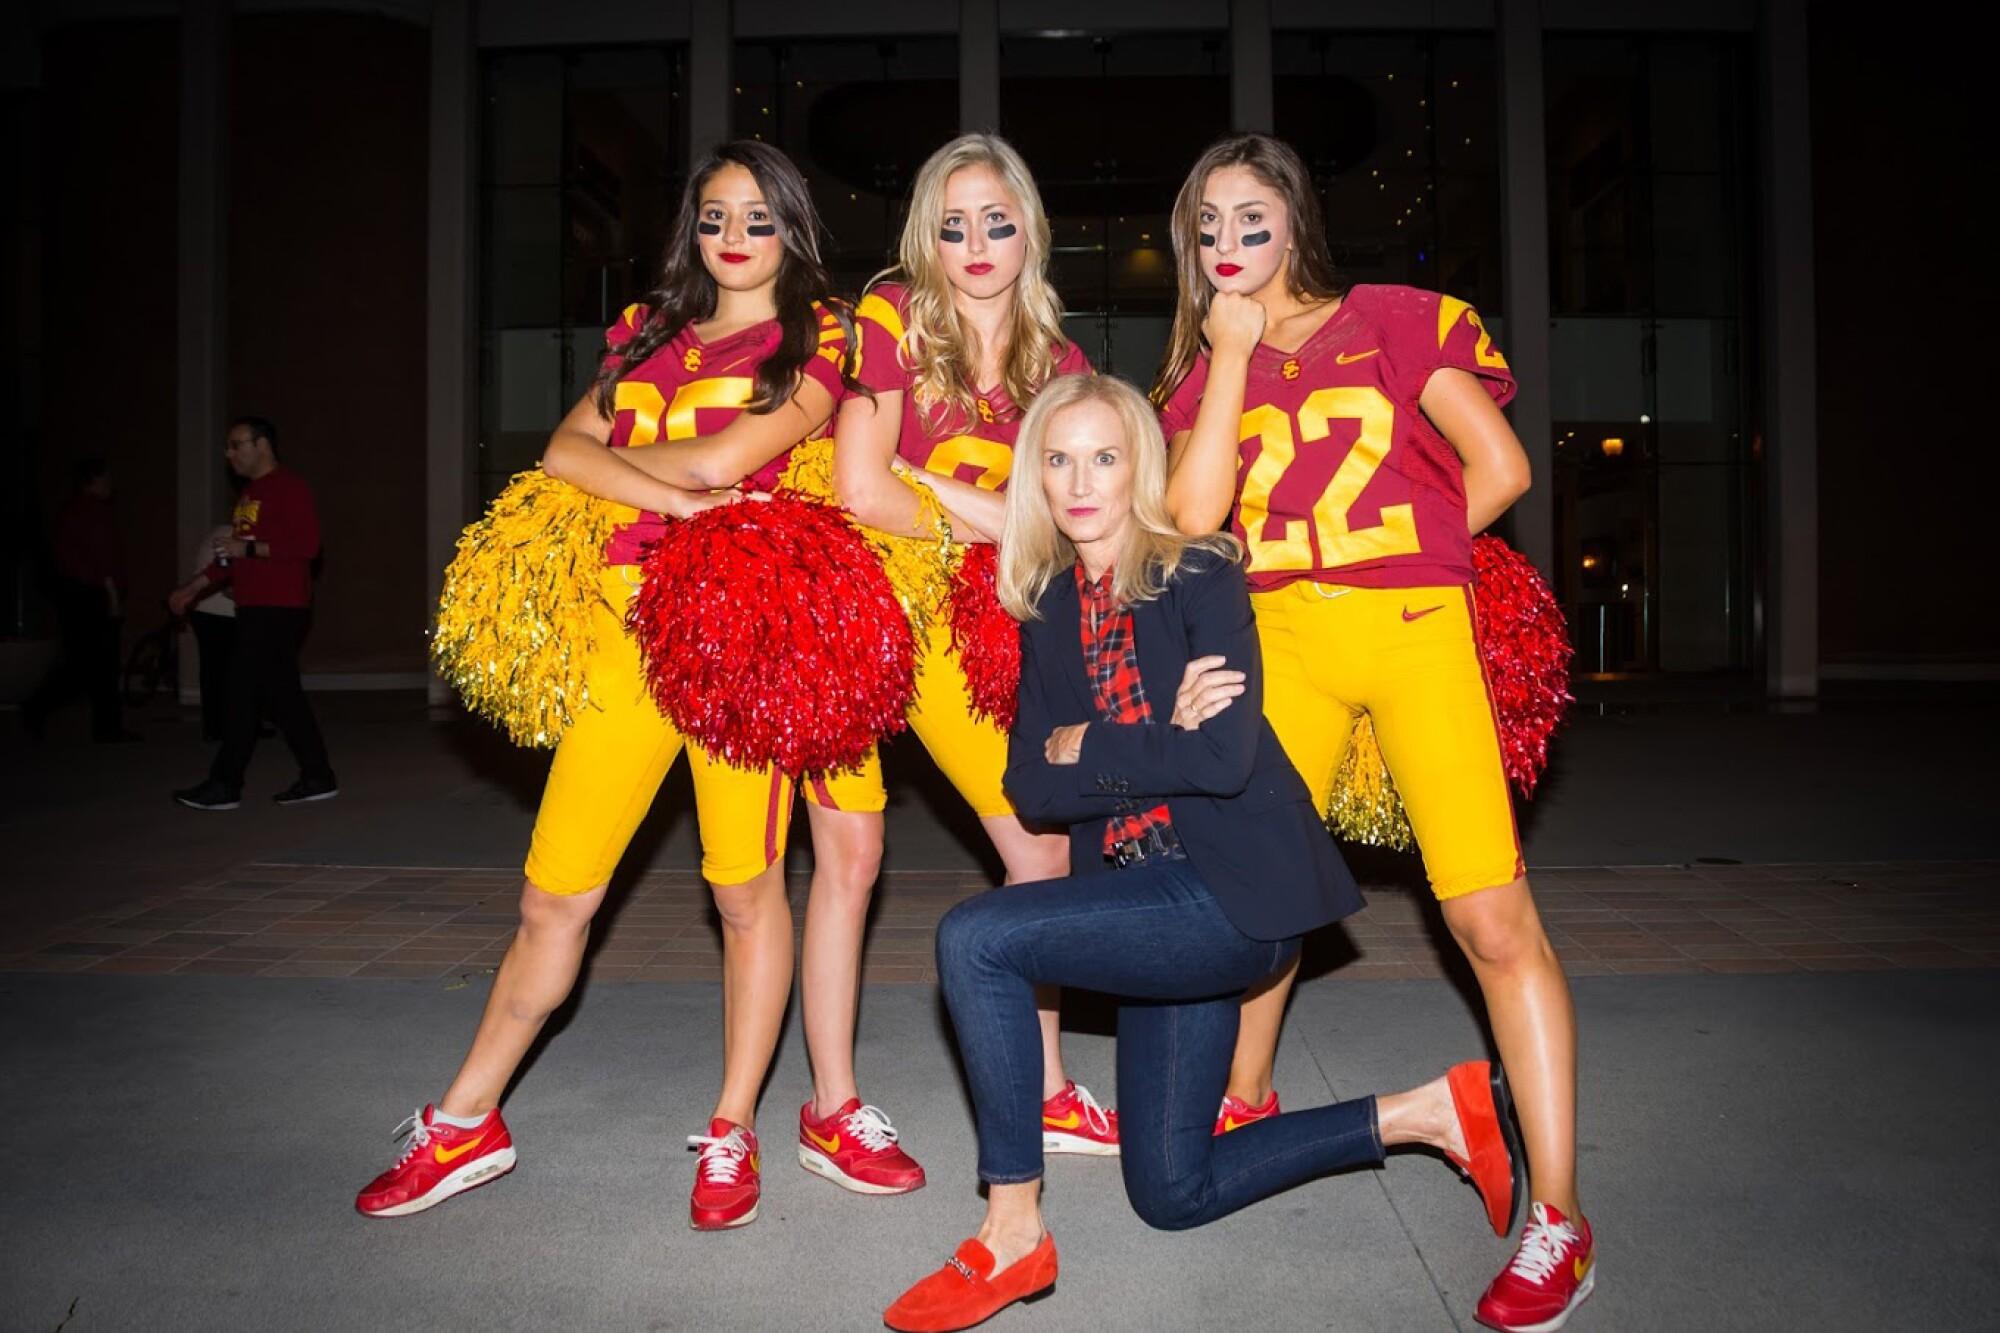 From L-R, Aya Shimizu, Lauren Dunn and Adrianna Robakowski pose with Lori Nelson.